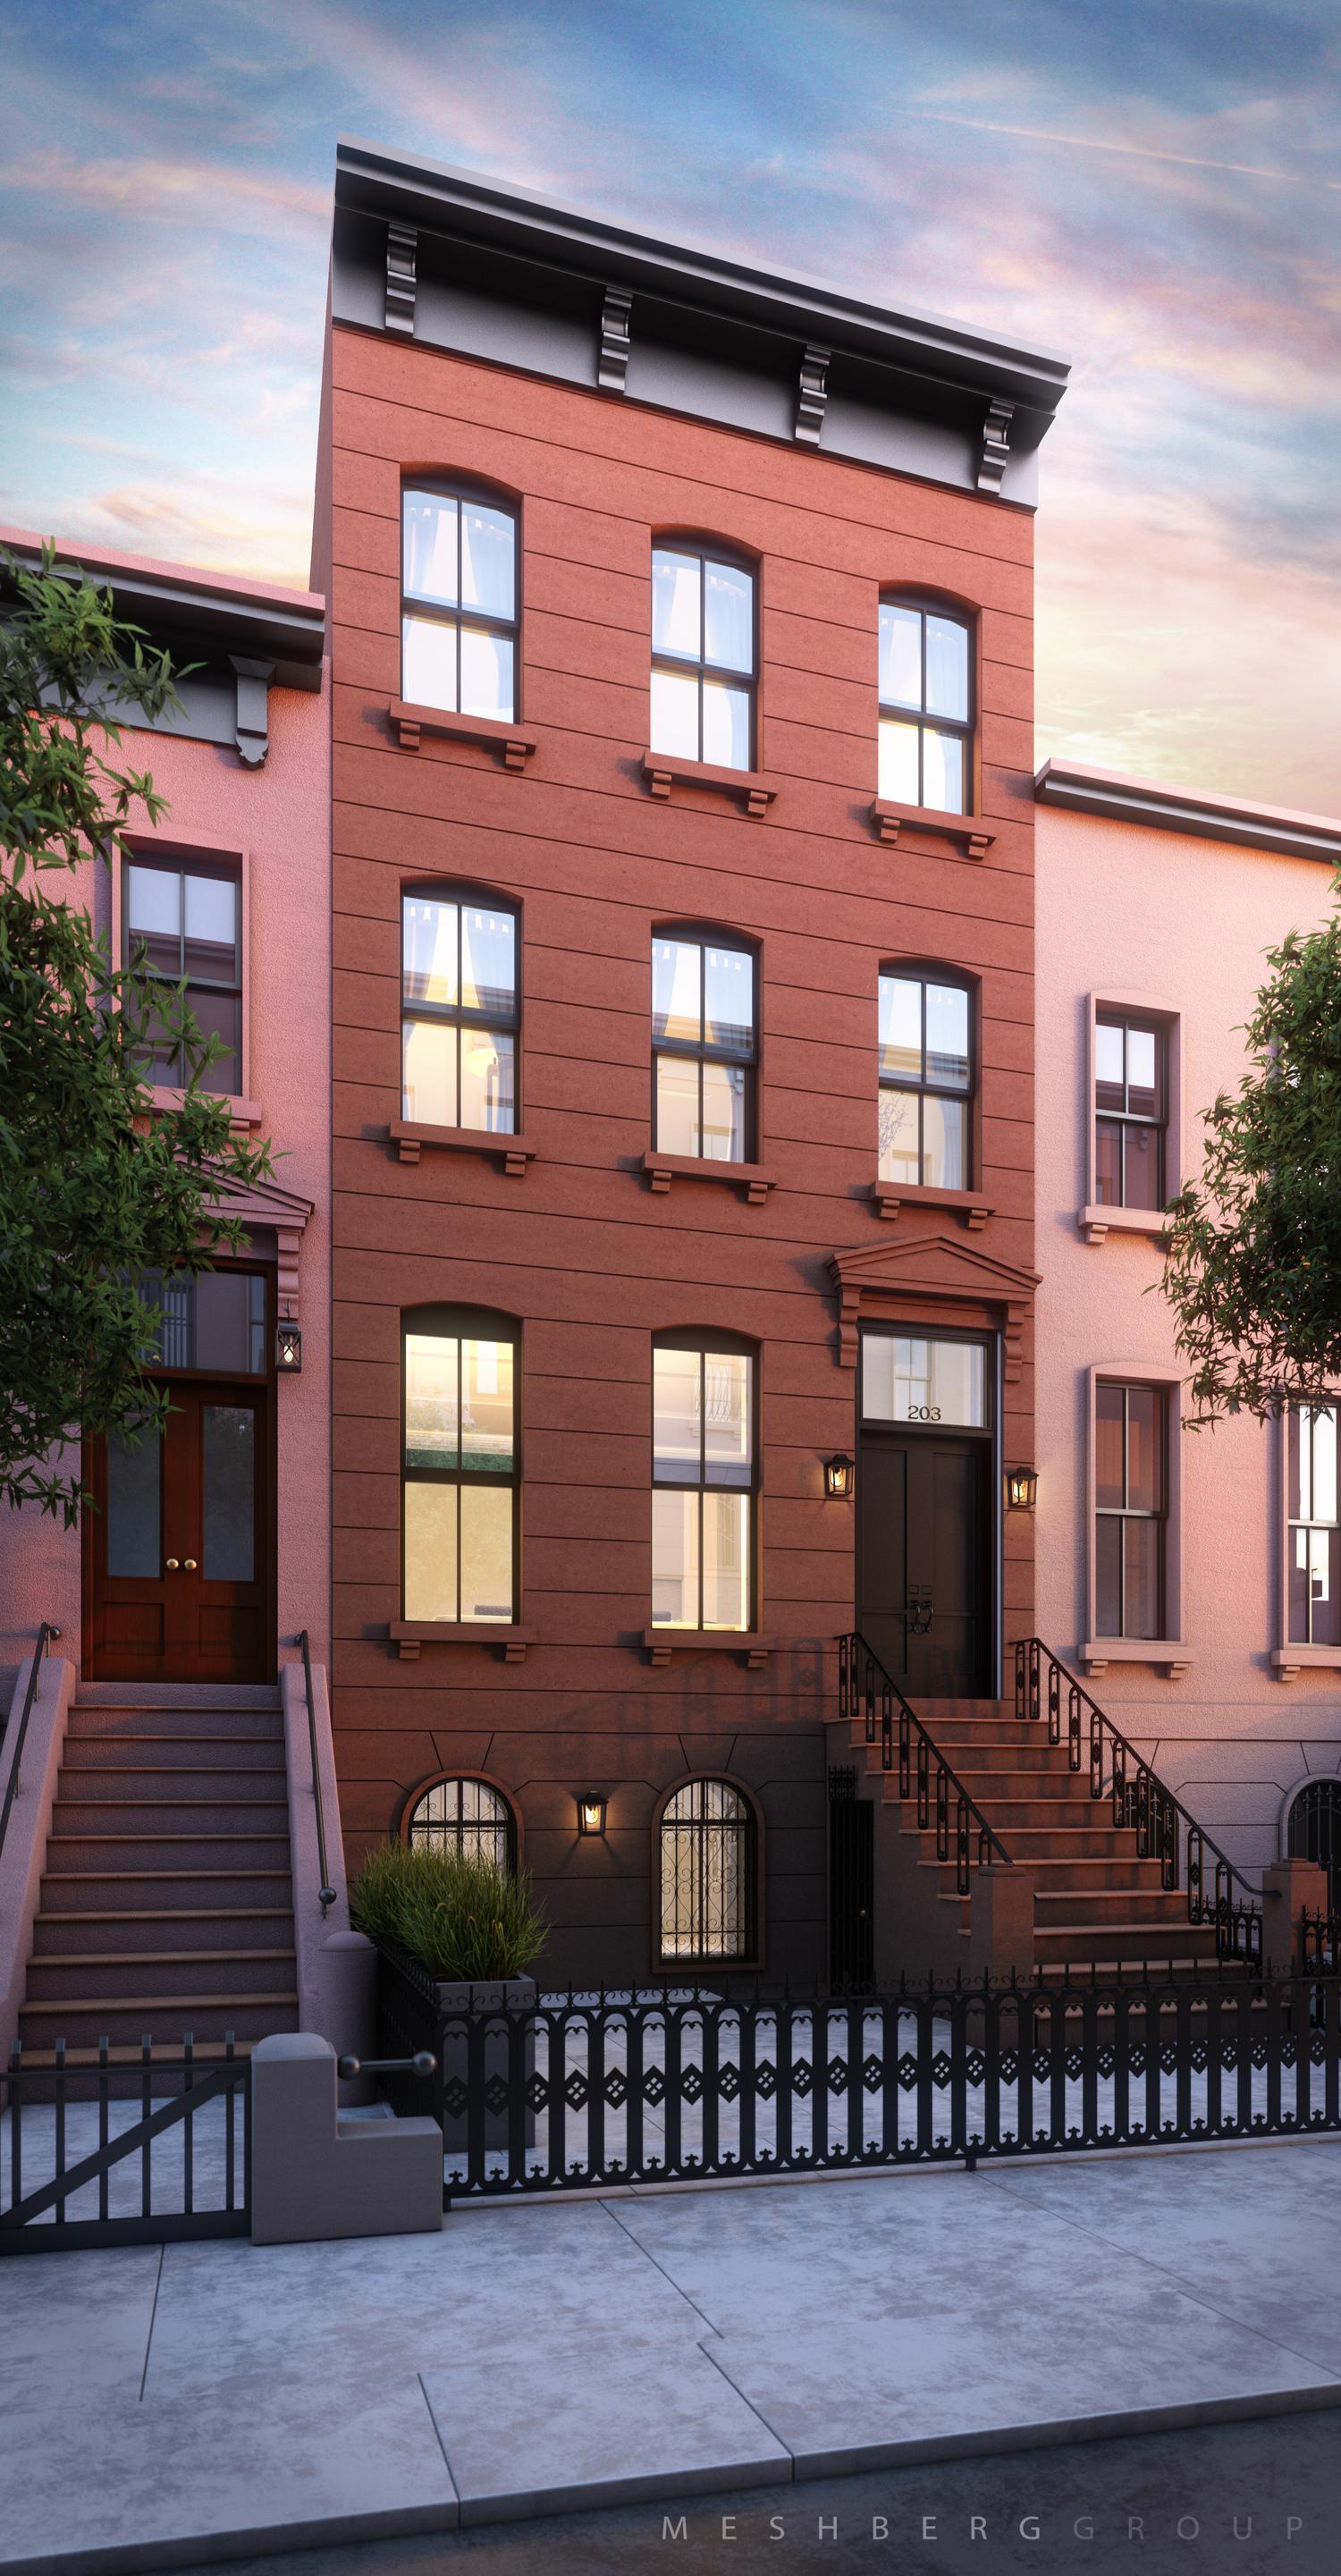 203 Bergen Street facade, rendering by Meshberg Group